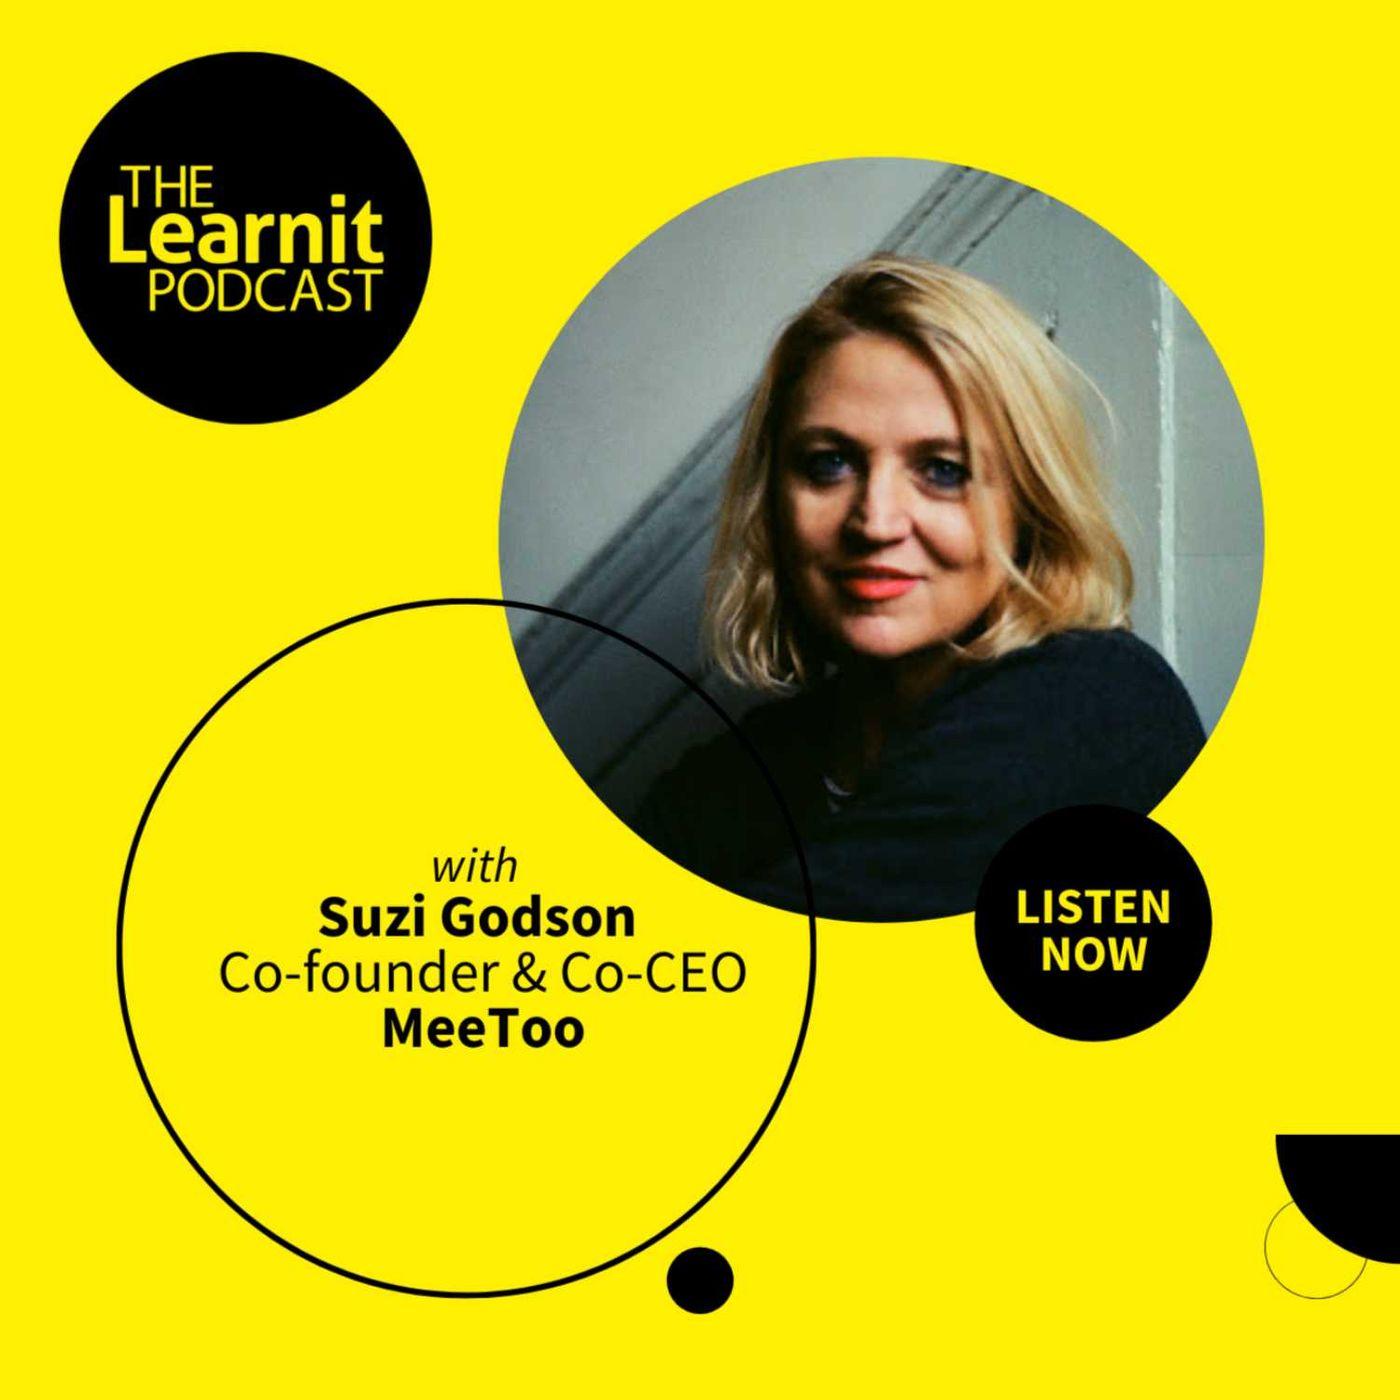 #33, Suzi Godson, Co-founder & Co-CEO, MeeToo: Social Solutions For Social Problems